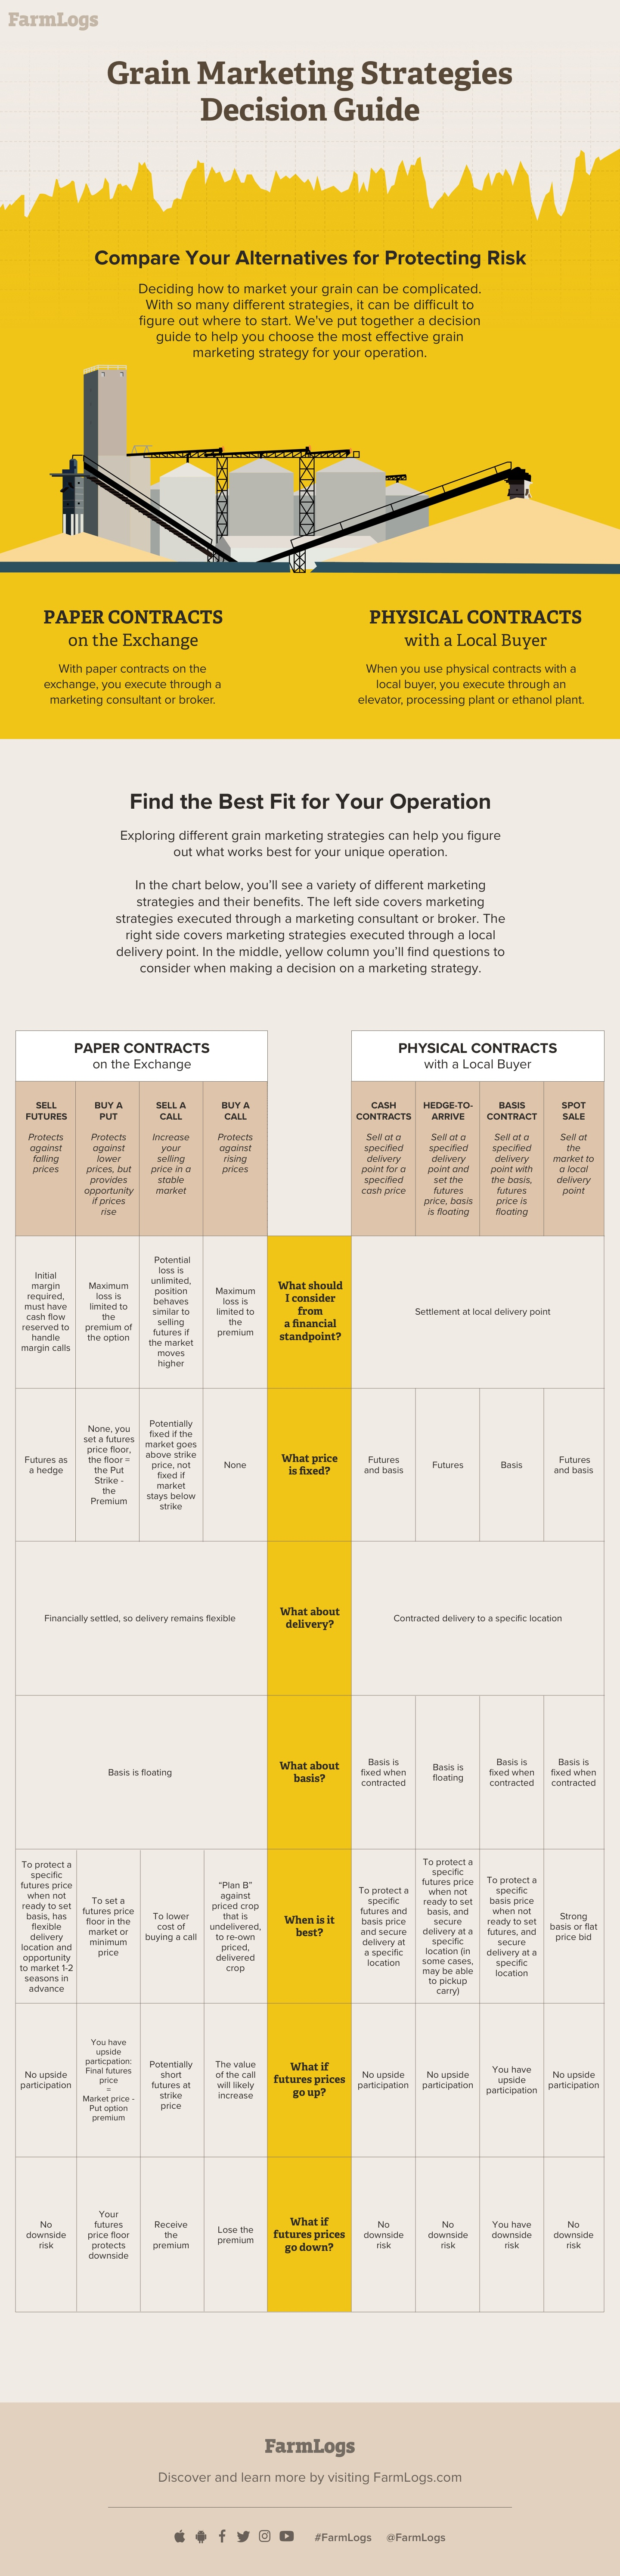 grain marketing strategies decision guide